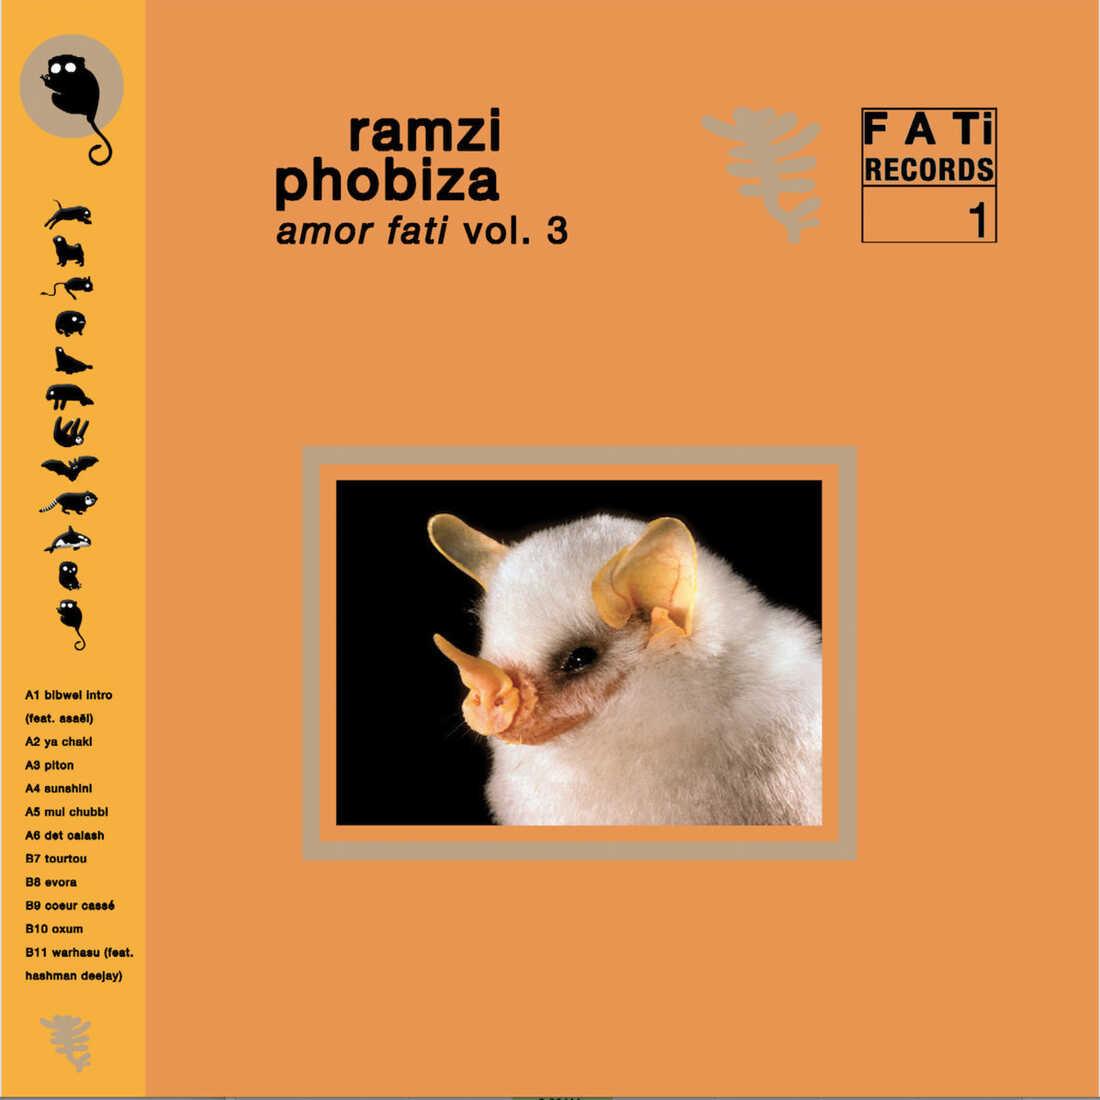 Ramzi Phobiza Vol. 3: Amor Fati (FATi Records)